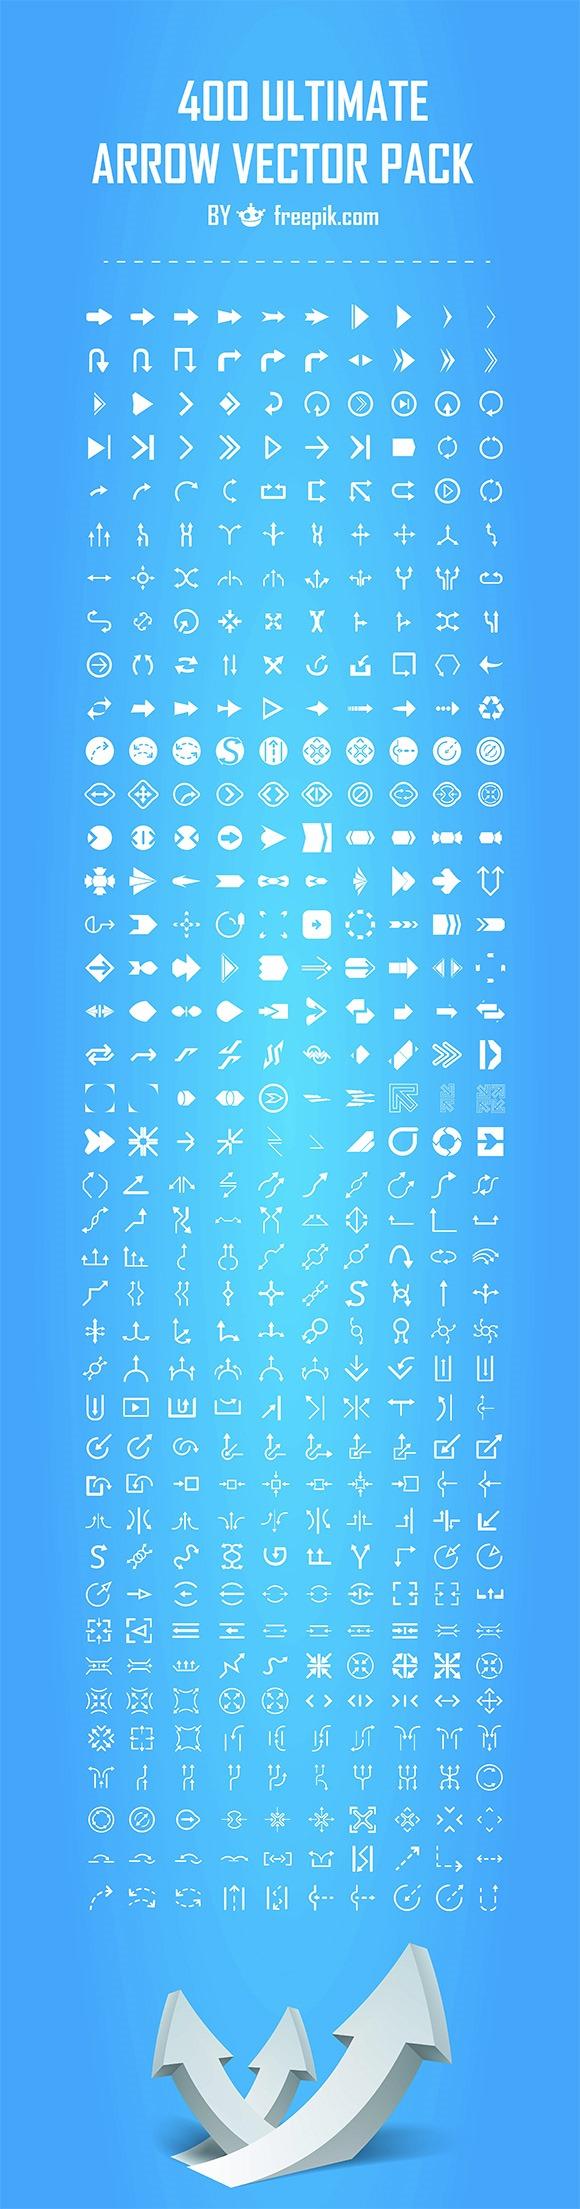 arrow set thumb 1000+ bundle of amazing free design resources